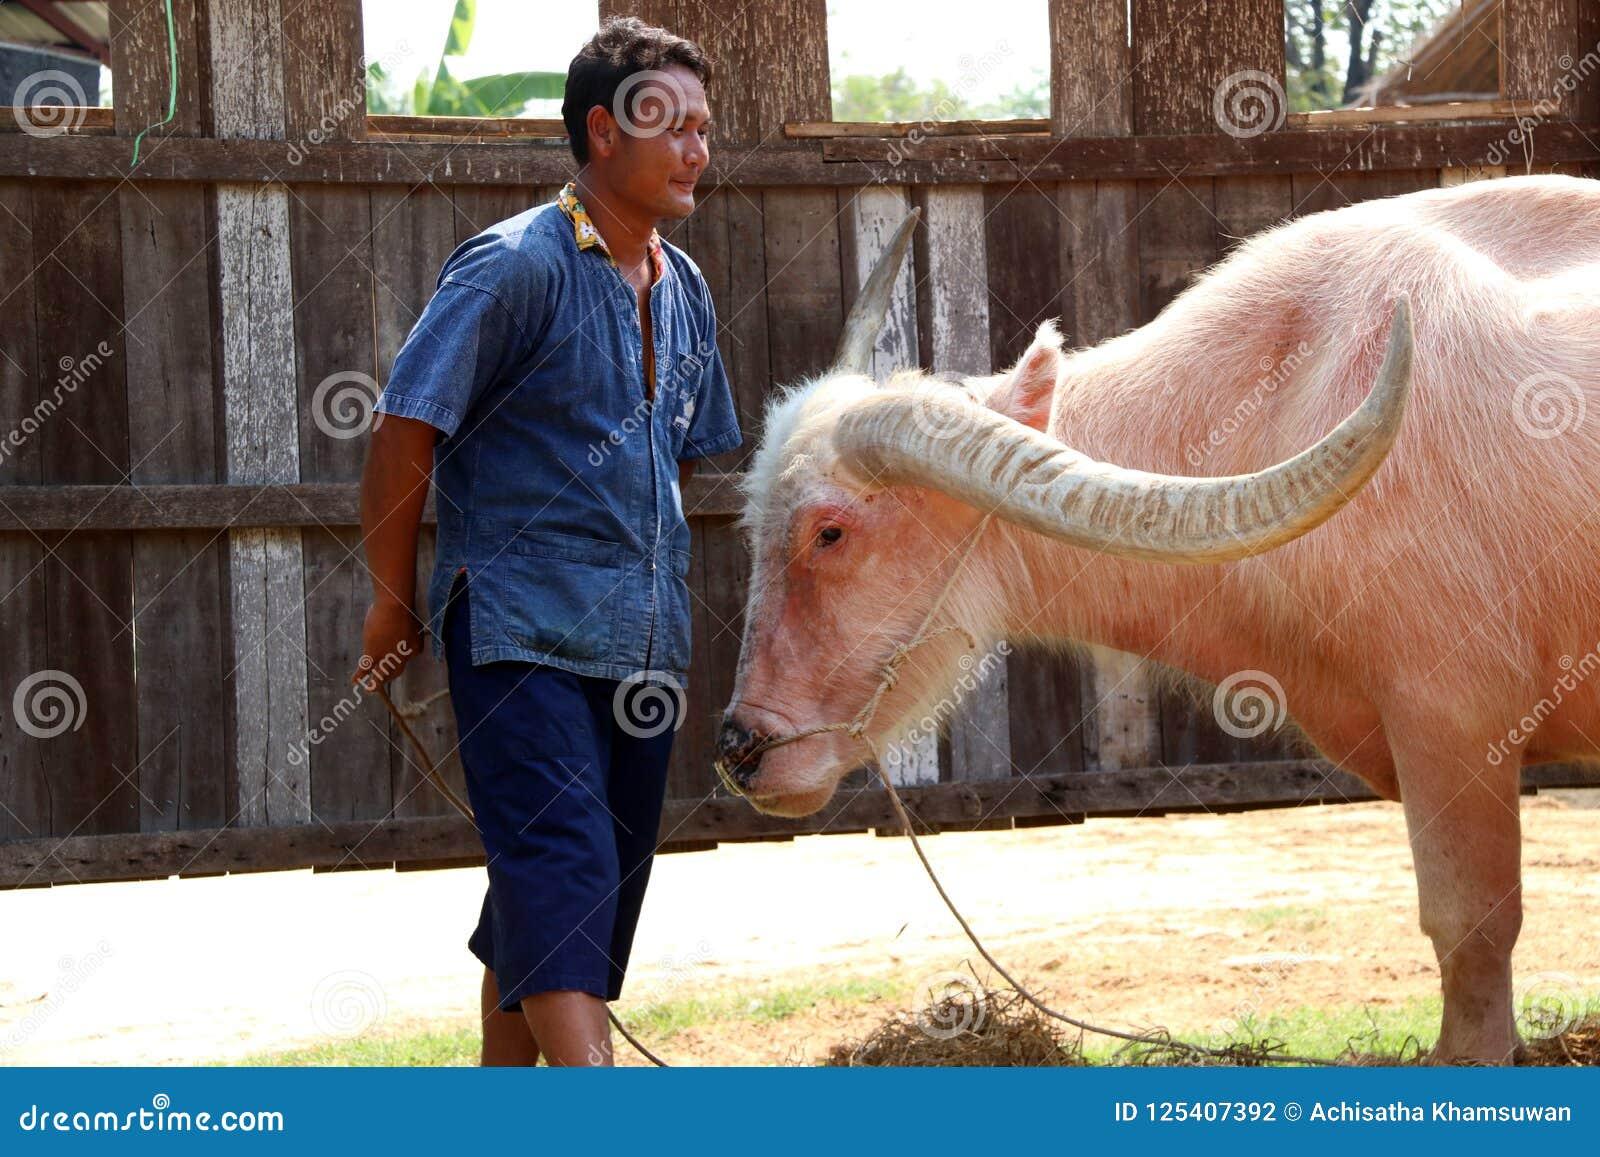 Man and buffalo